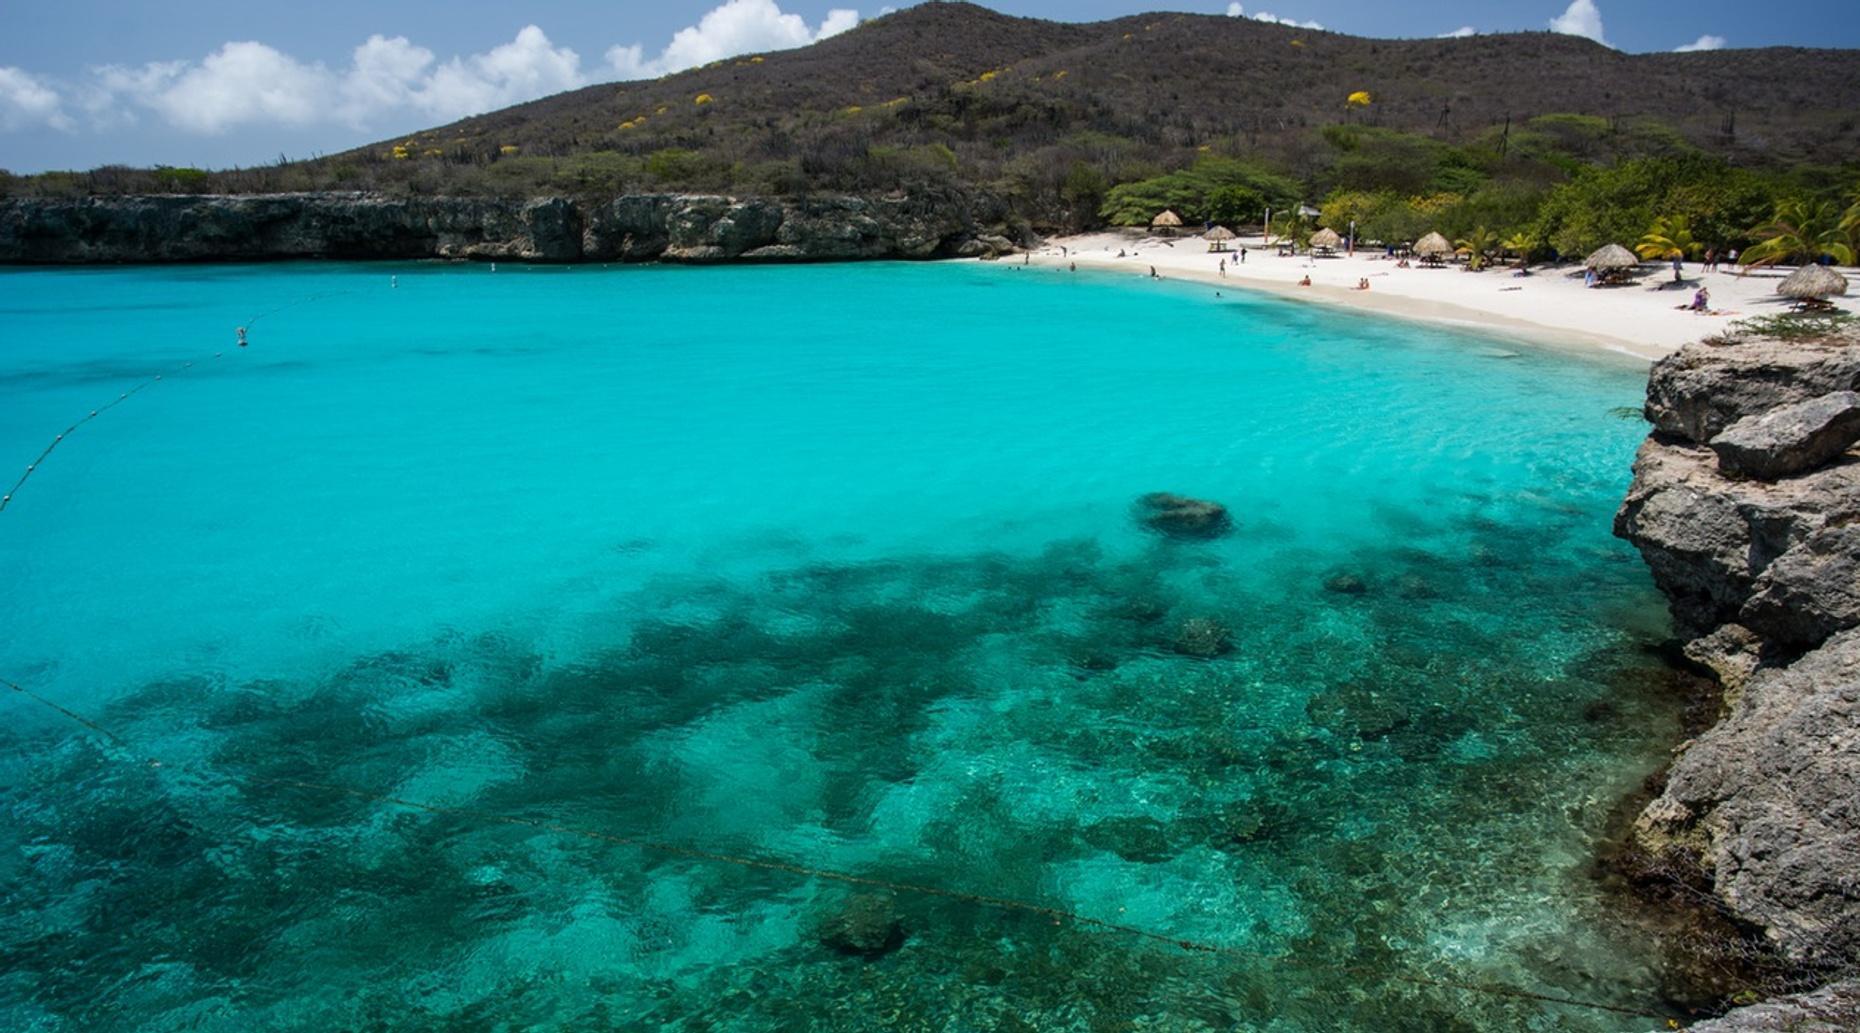 1-Hour Playa Del Carmen Photo Shoot